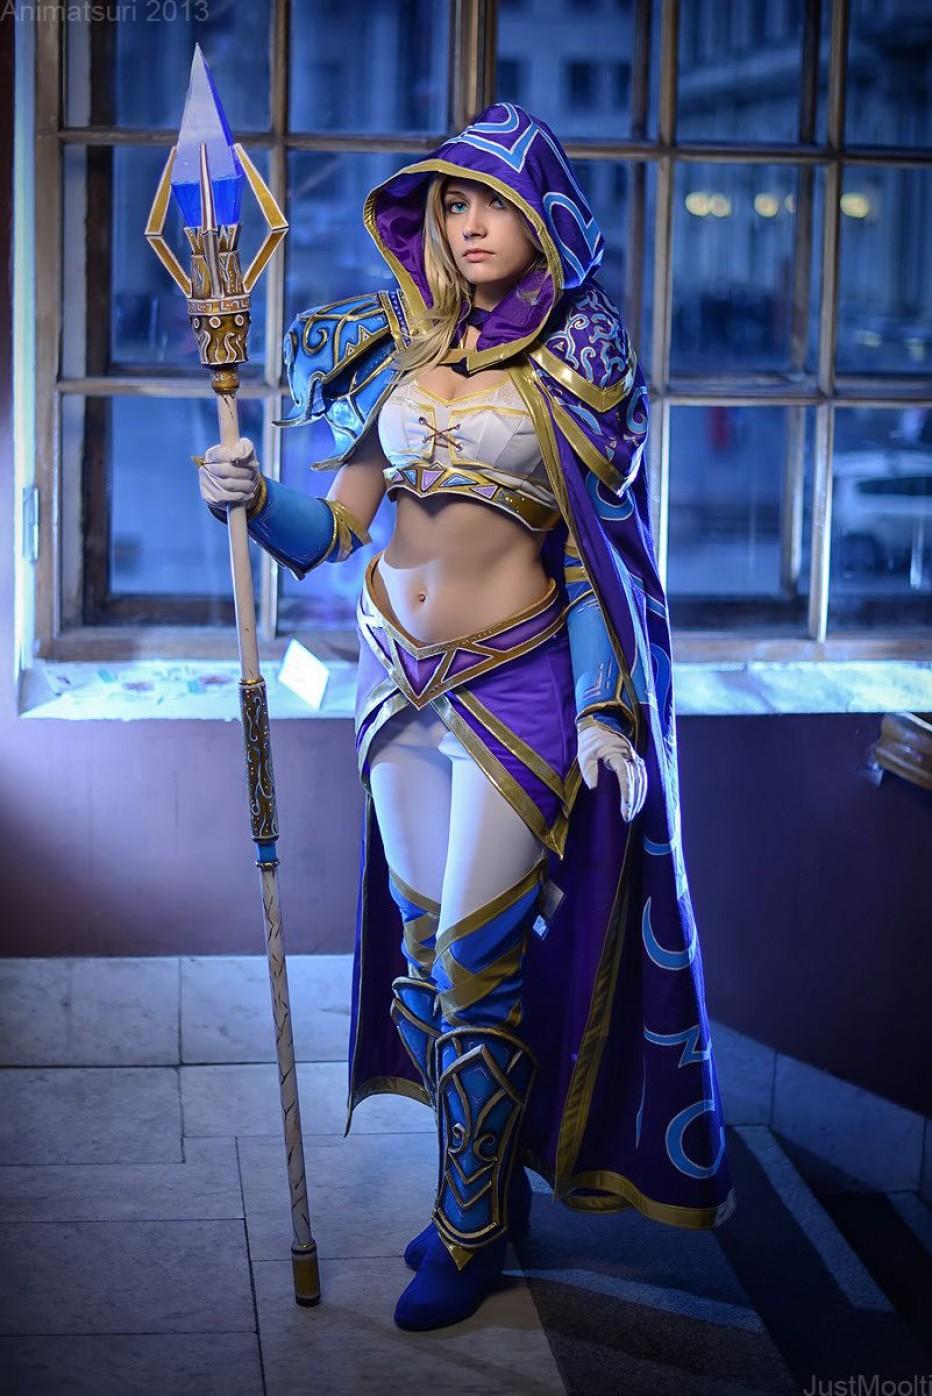 Warcraft-III-Jaina-Proudmoore-Narga-Cosplay-Gamers-Heroes-17.jpg